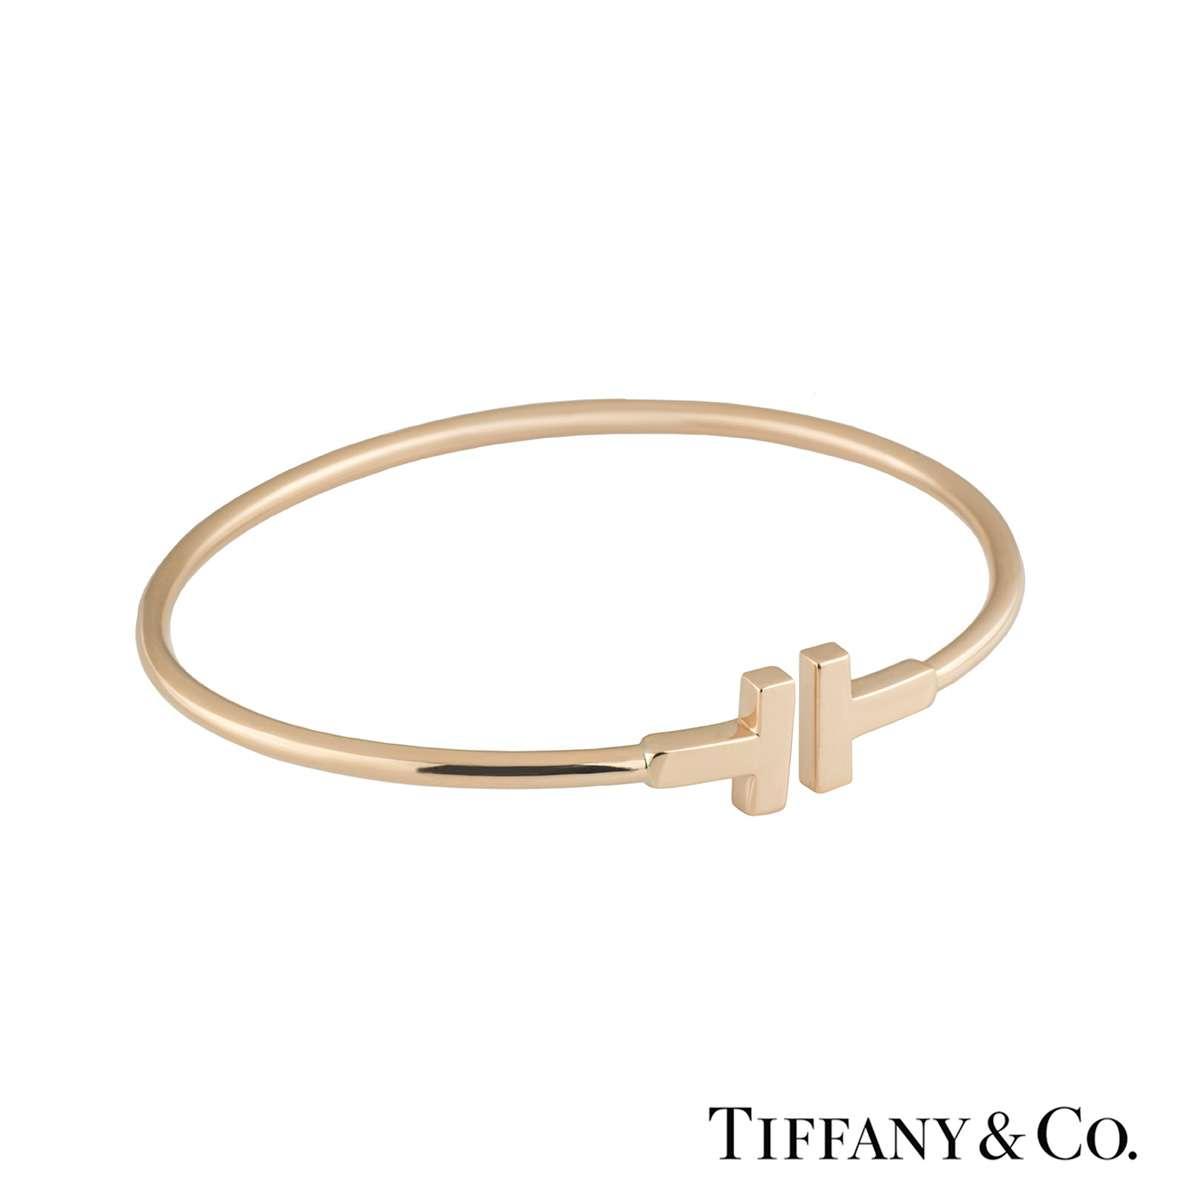 Tiffany Amp Co Tiffany T Wire Bracelet